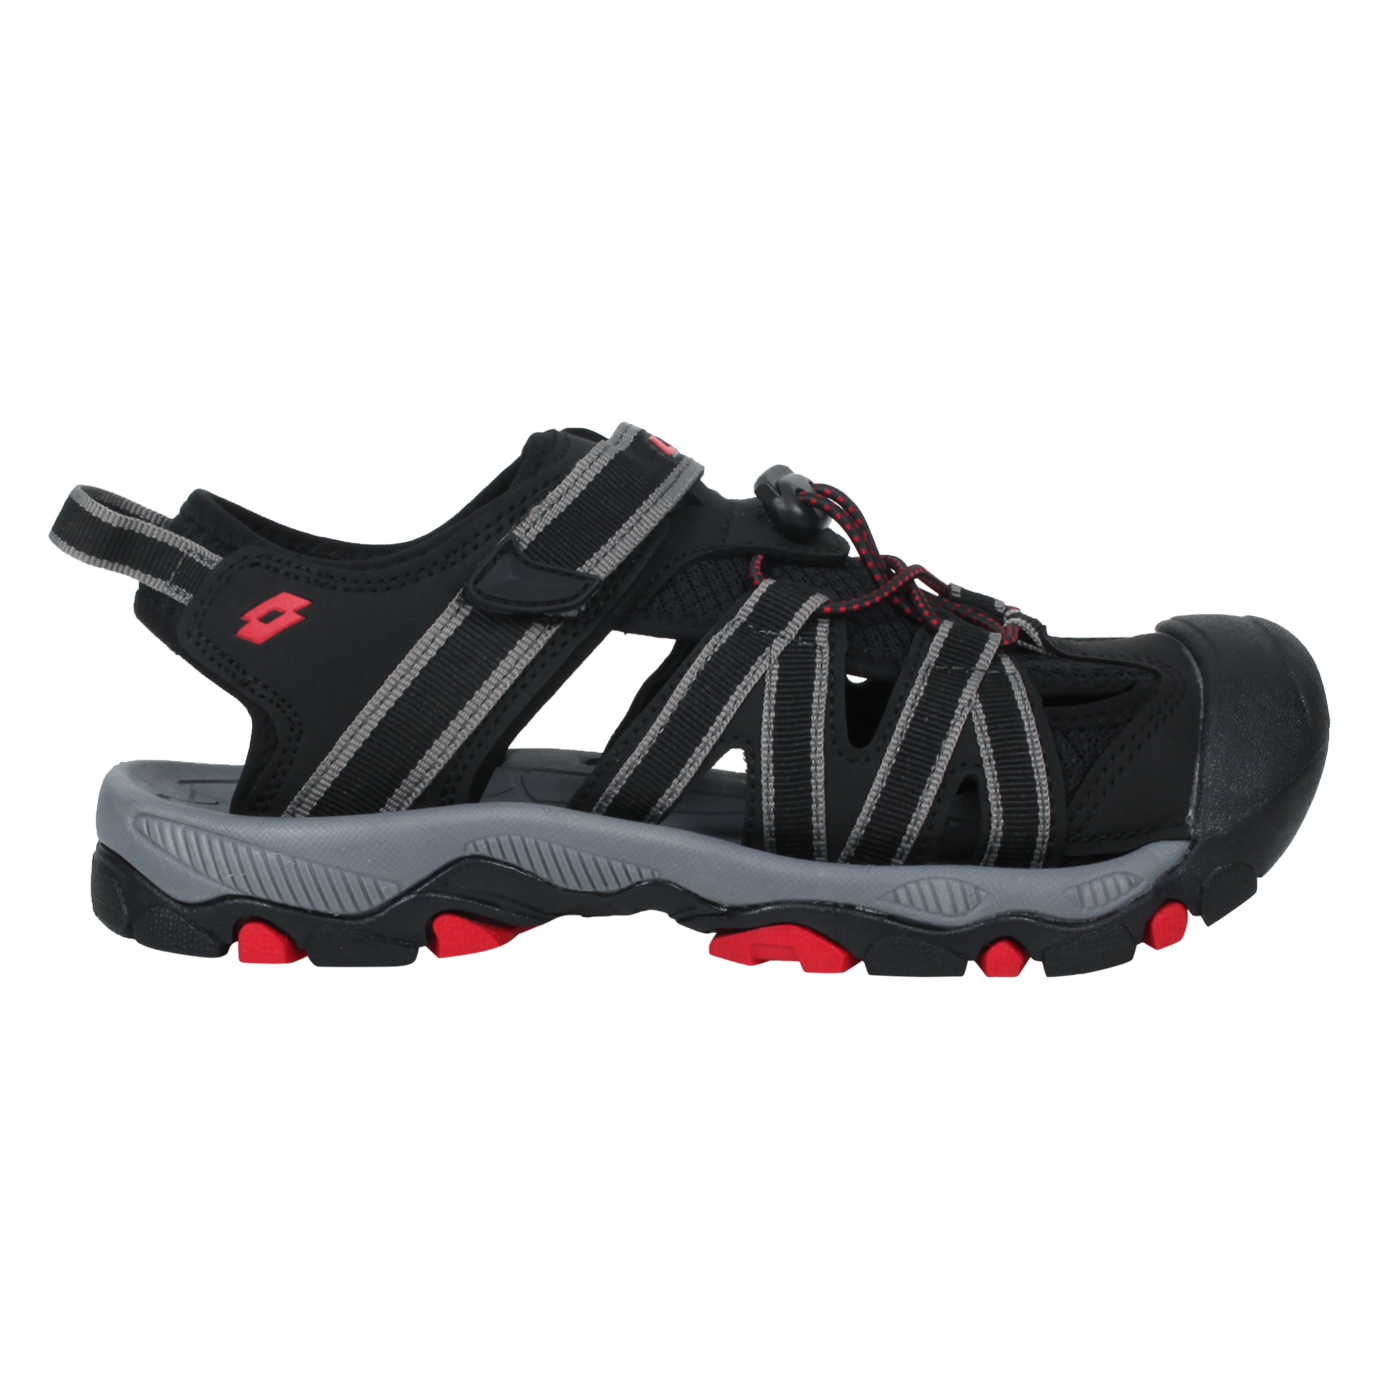 LOTTO 輕量護趾涼鞋 LT1AKS3320 - 黑紅